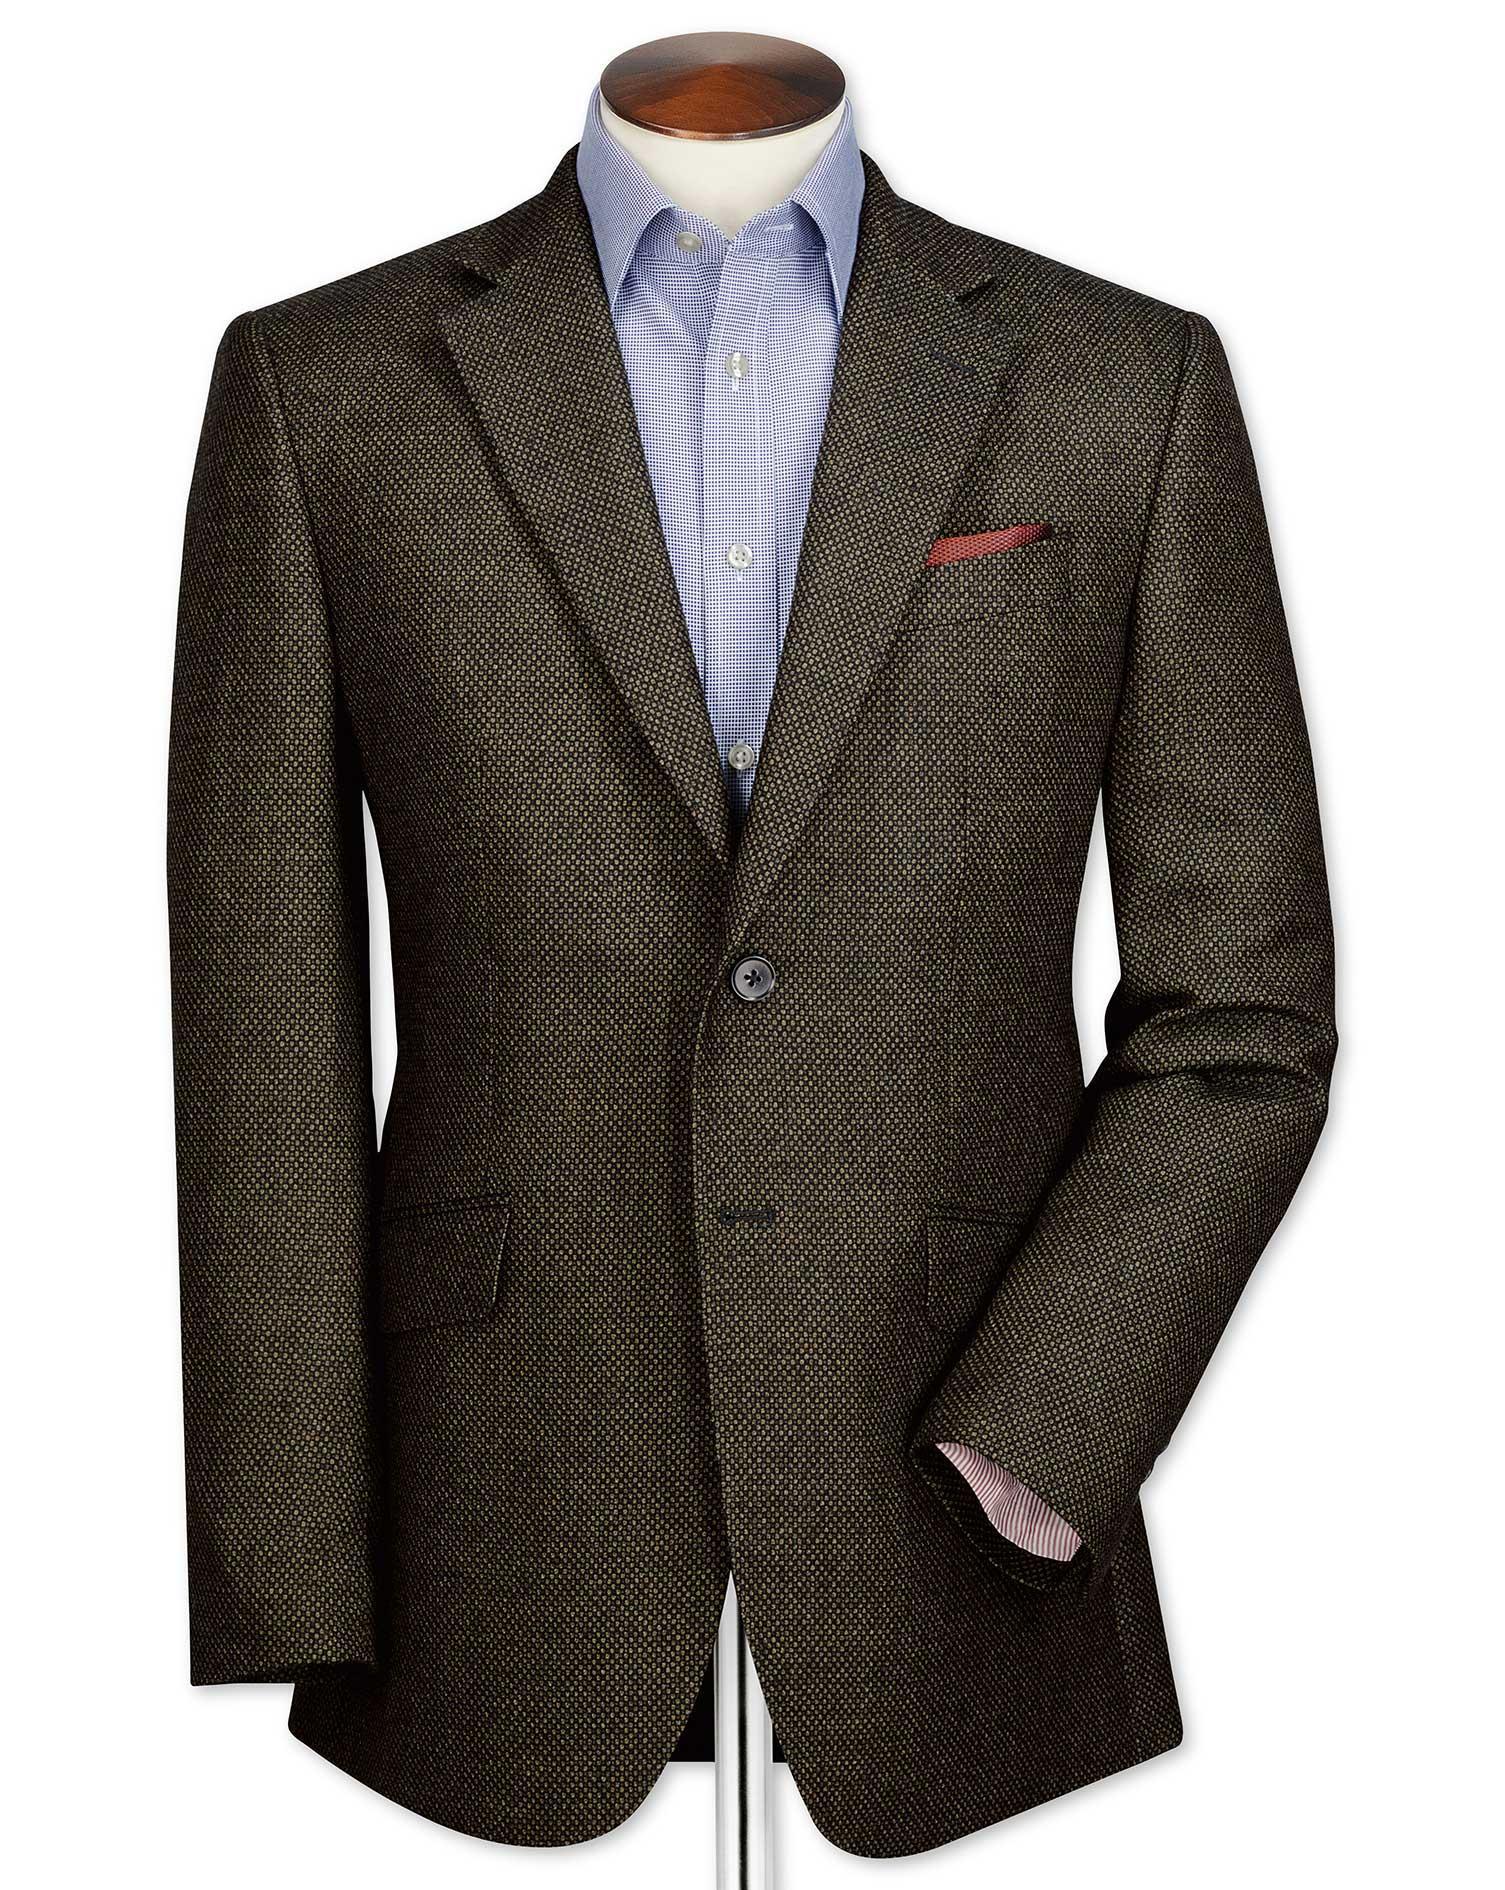 Classic Fit Olive Birdseye Lambswool Wool Jacket Size 38 Short by Charles Tyrwhitt